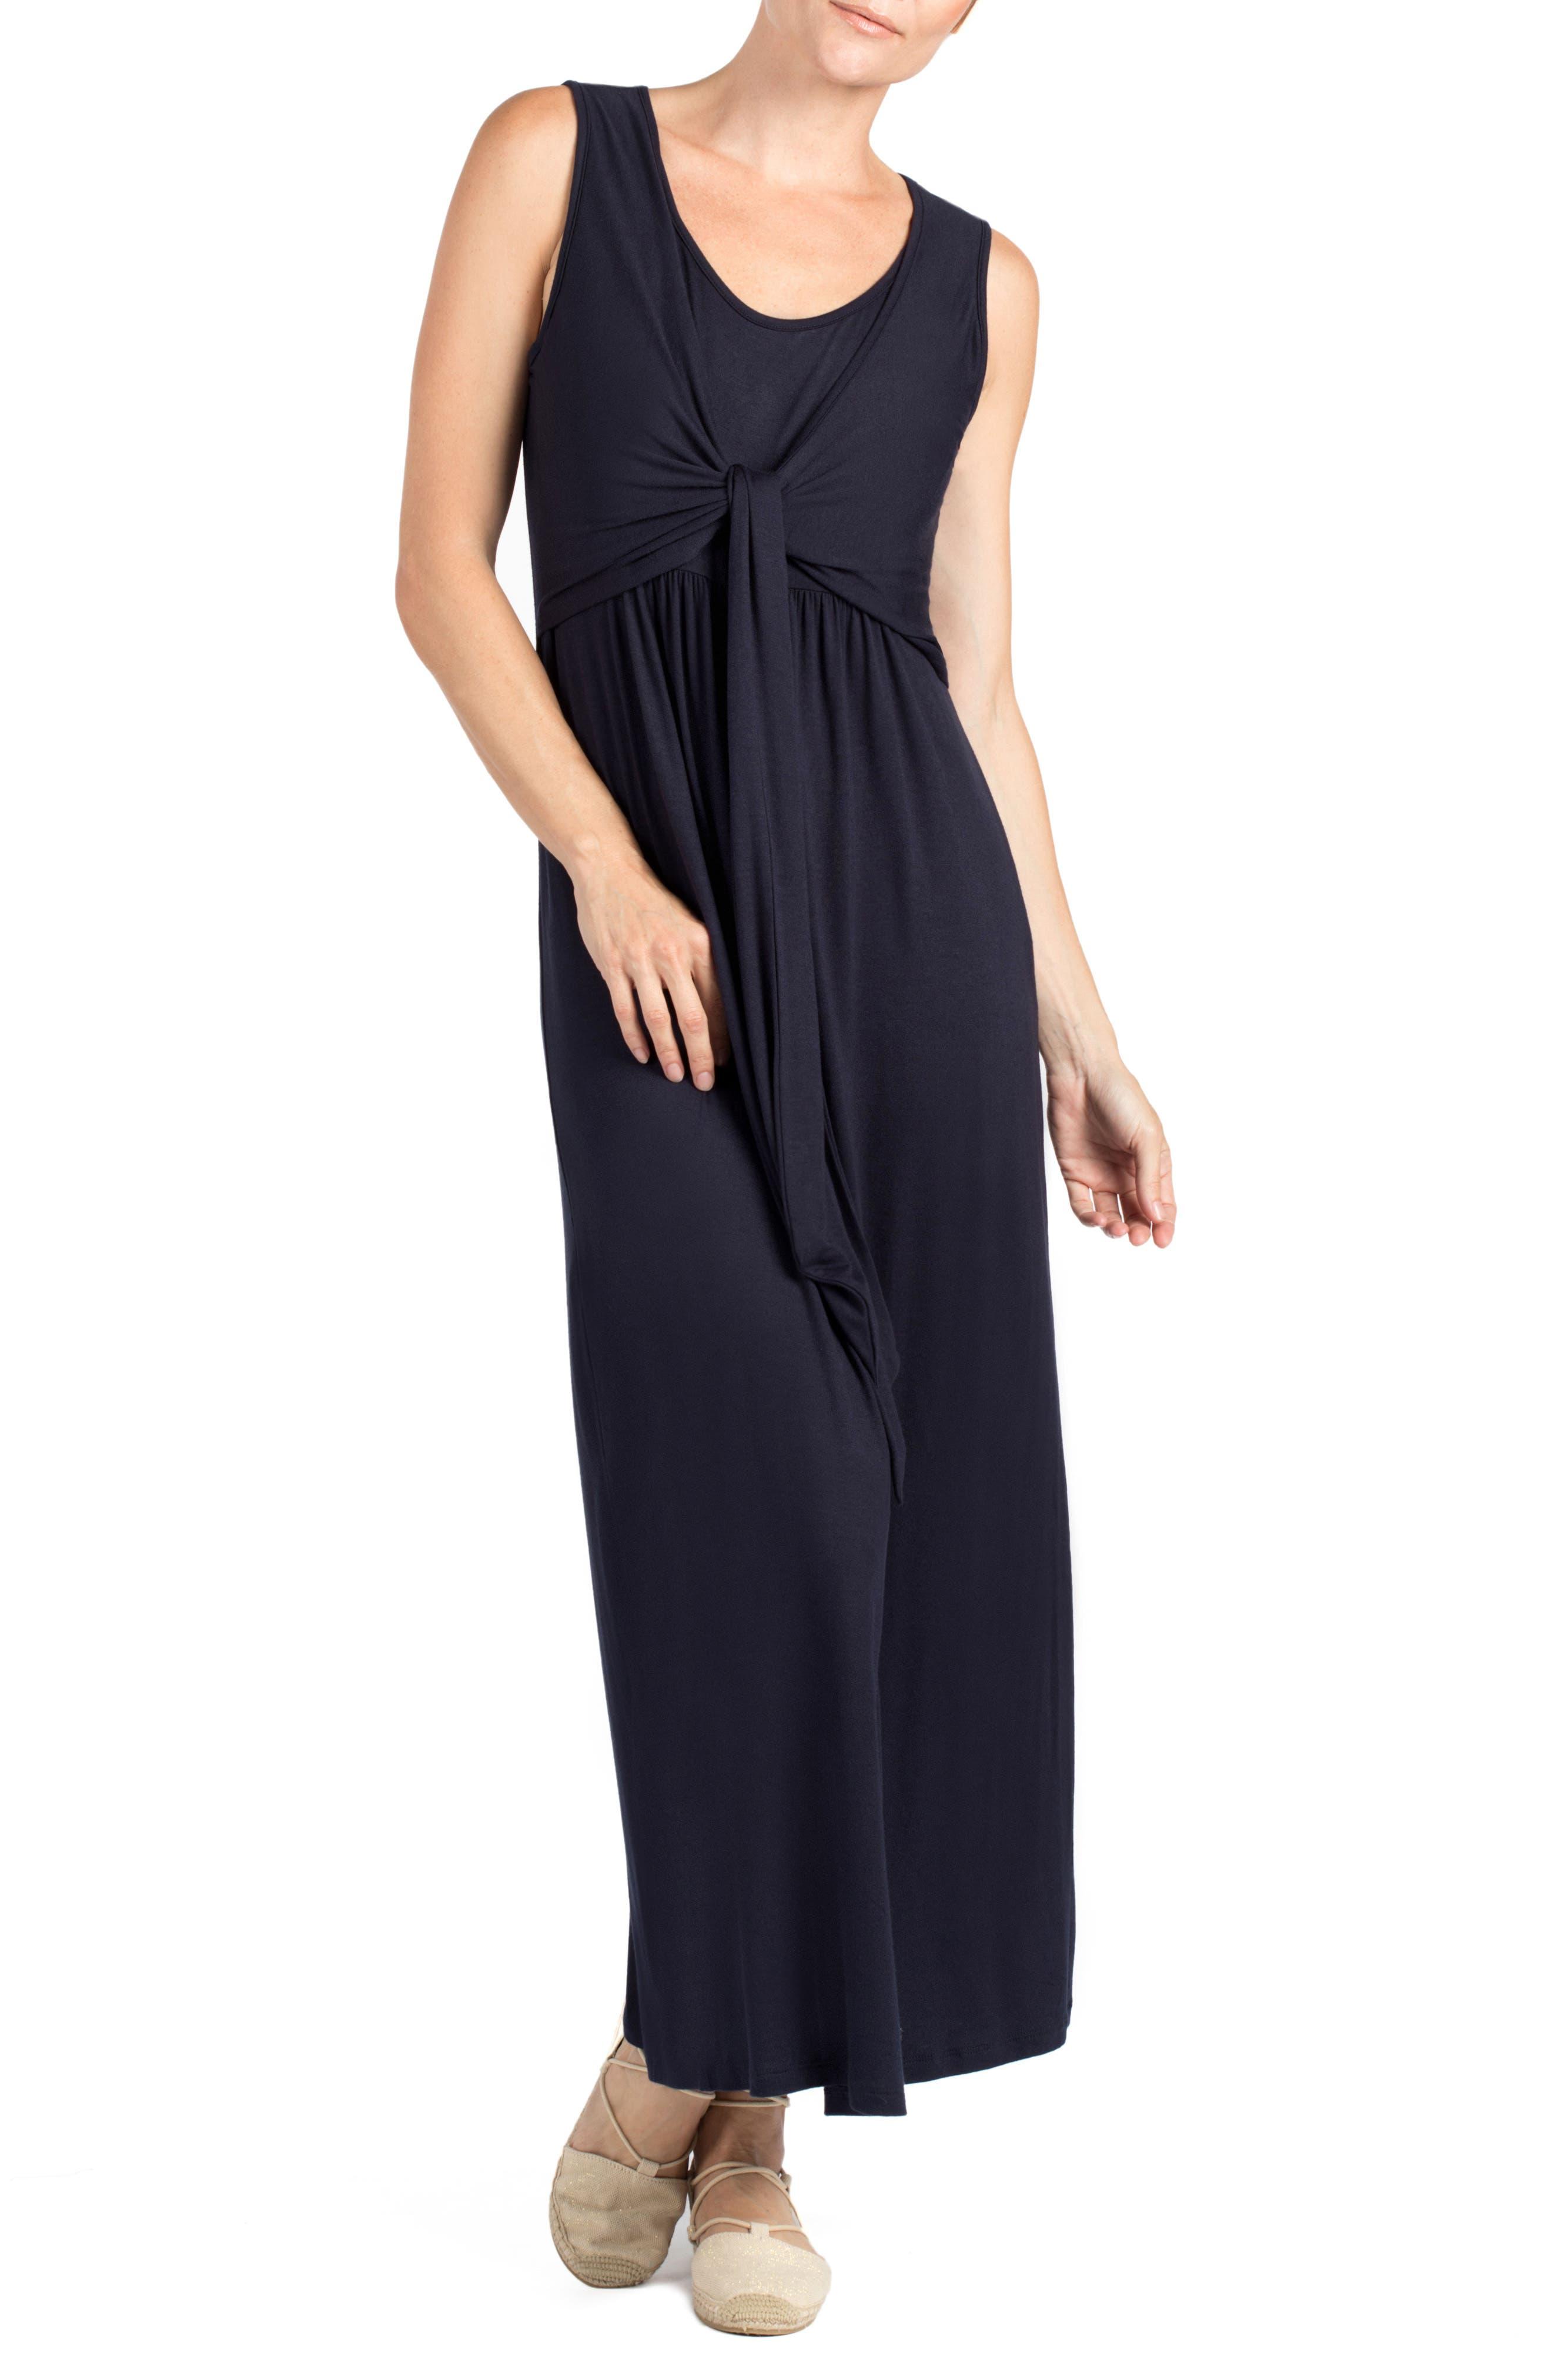 Modesto Maternity/Nursing Maxi Dress,                         Main,                         color, NAVY